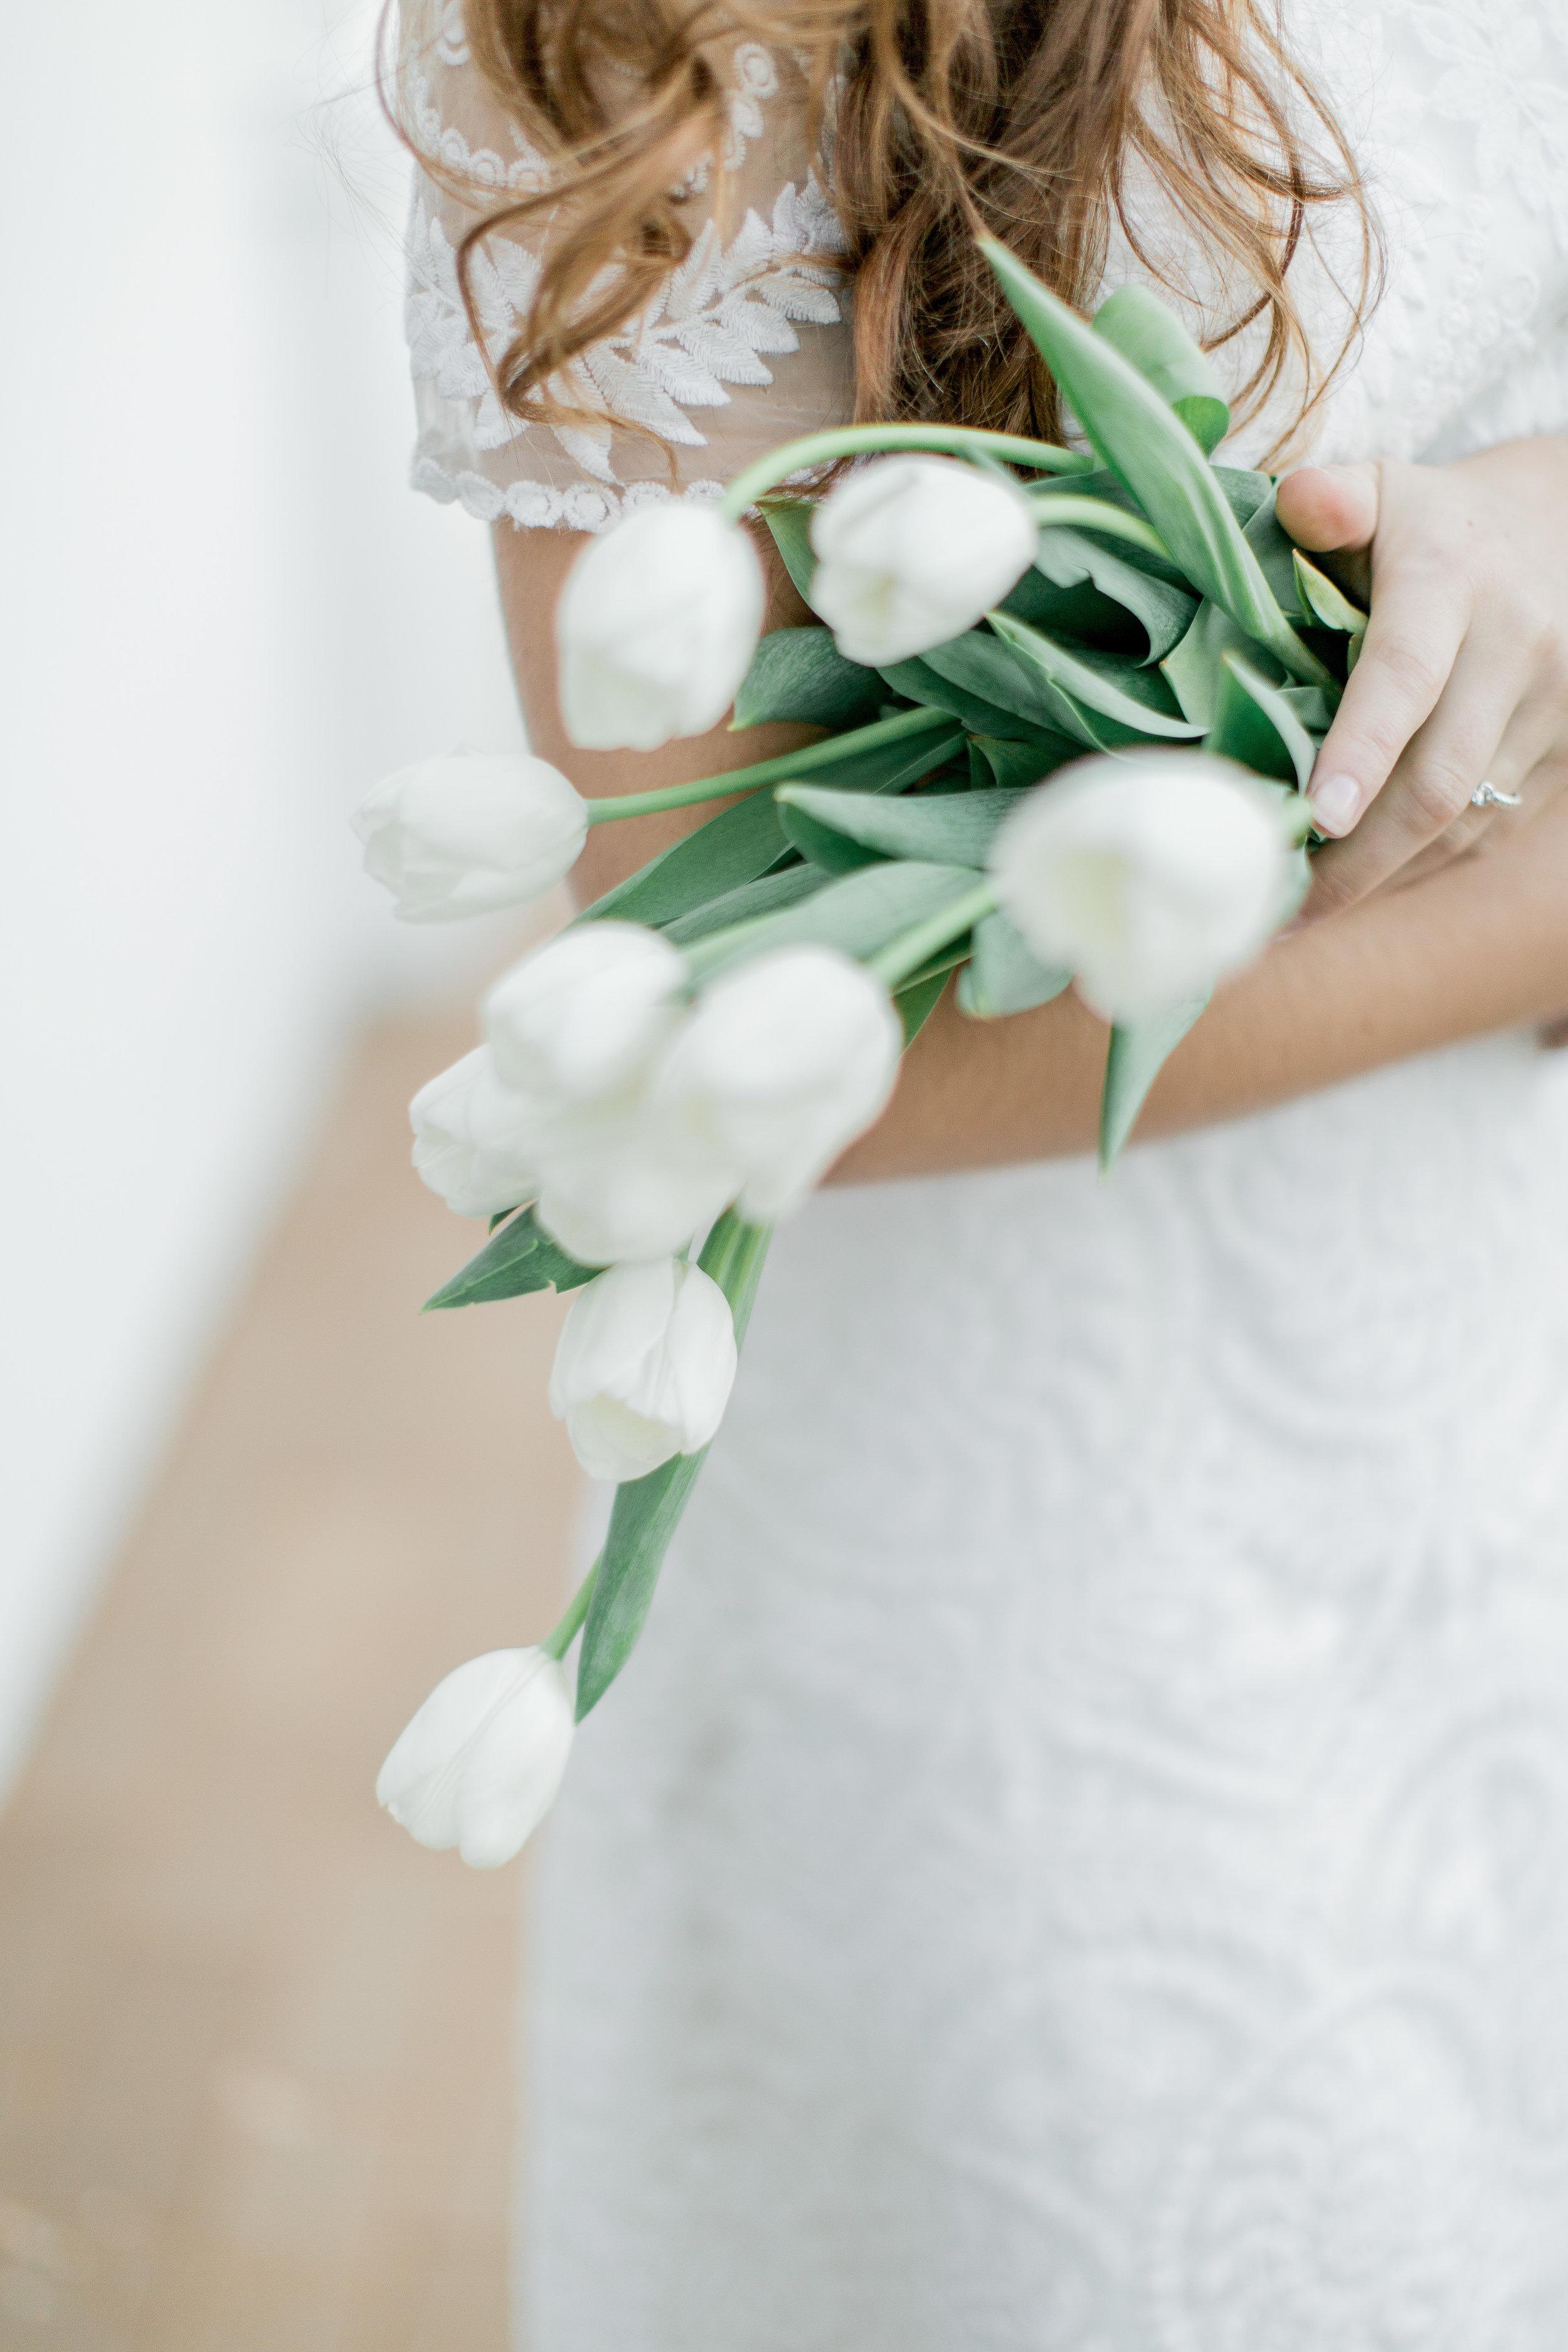 gauteng wedding photographer clareece smit28.jpg